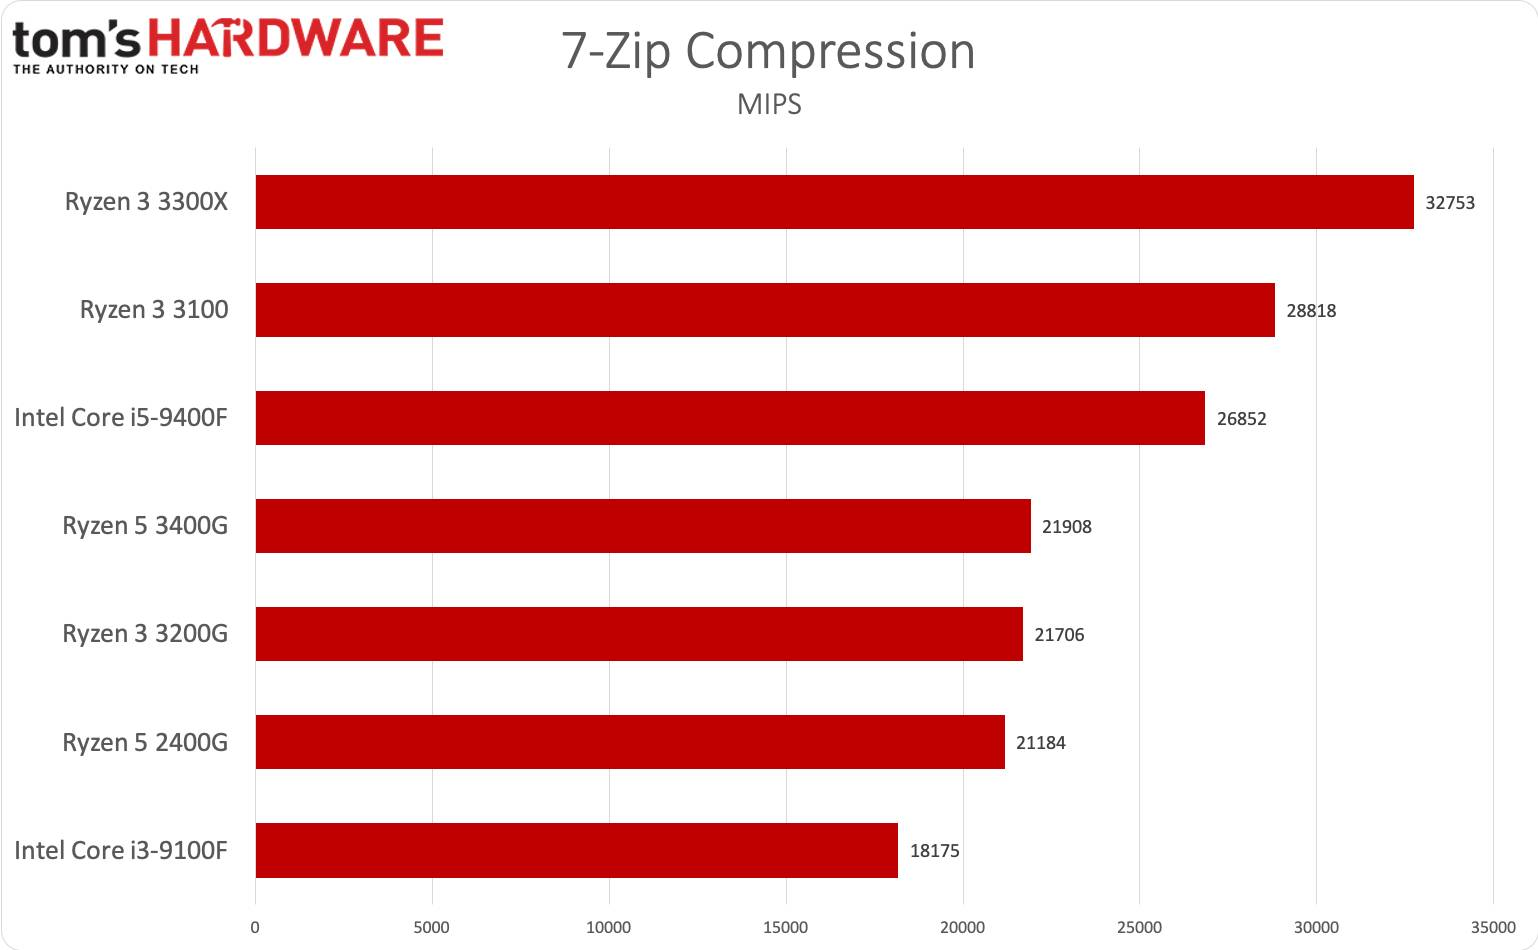 Ryzen 3 3300X e Ryzen 3 3100 - 7-Zip compression